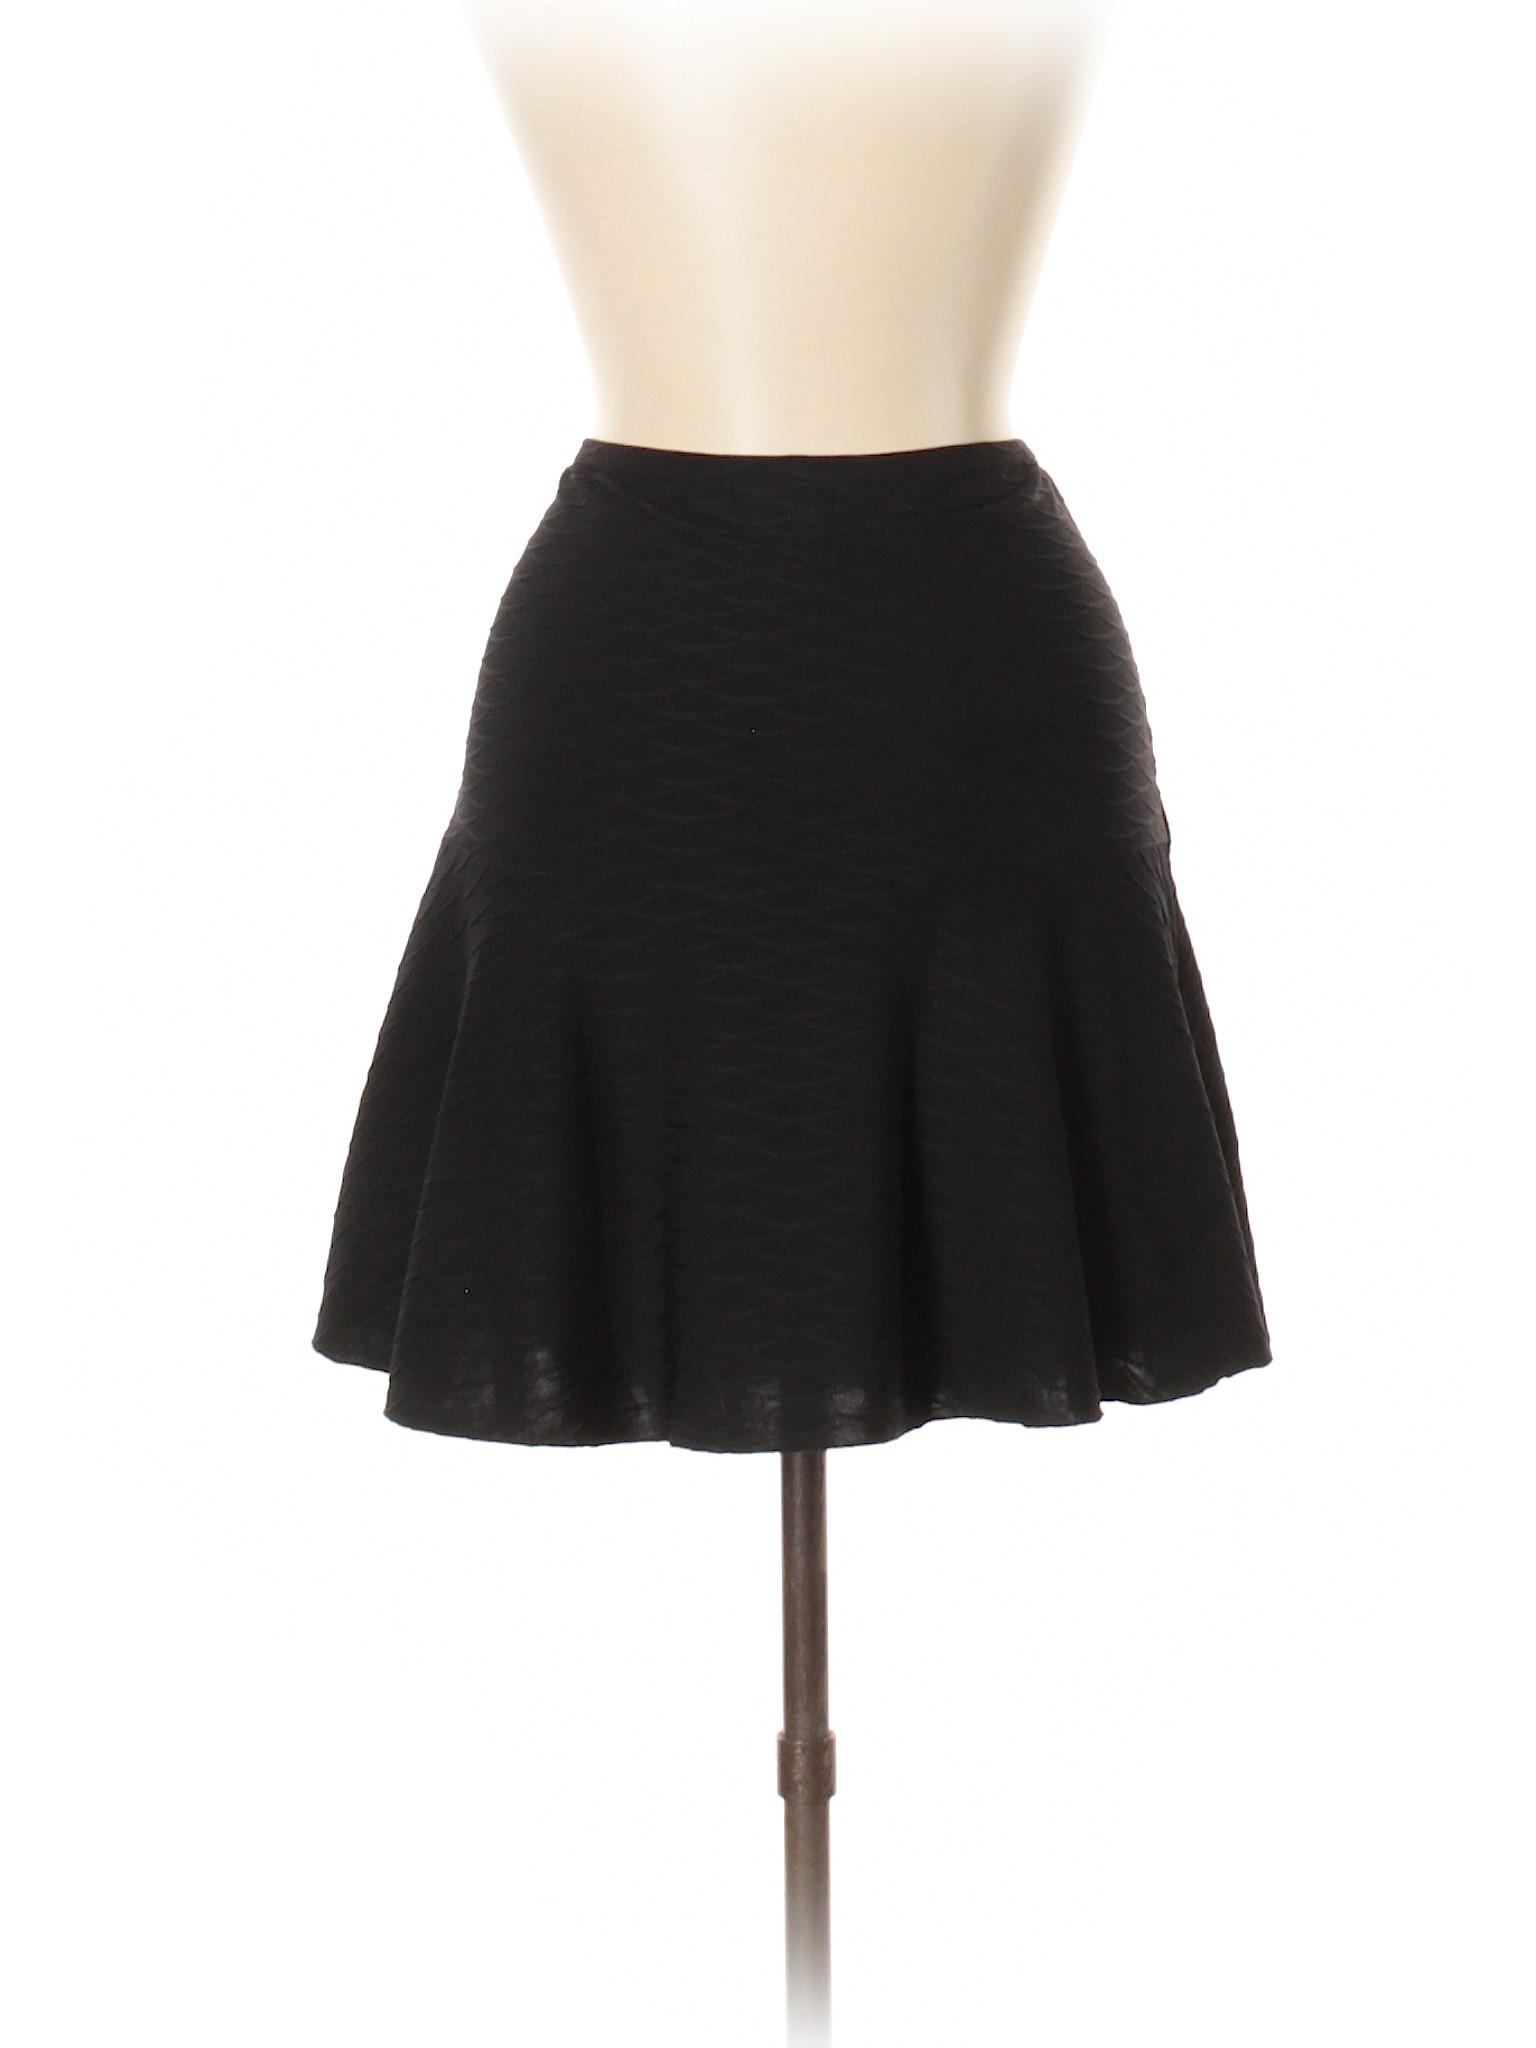 Skirt Casual Boutique Boutique Casual vqFBw